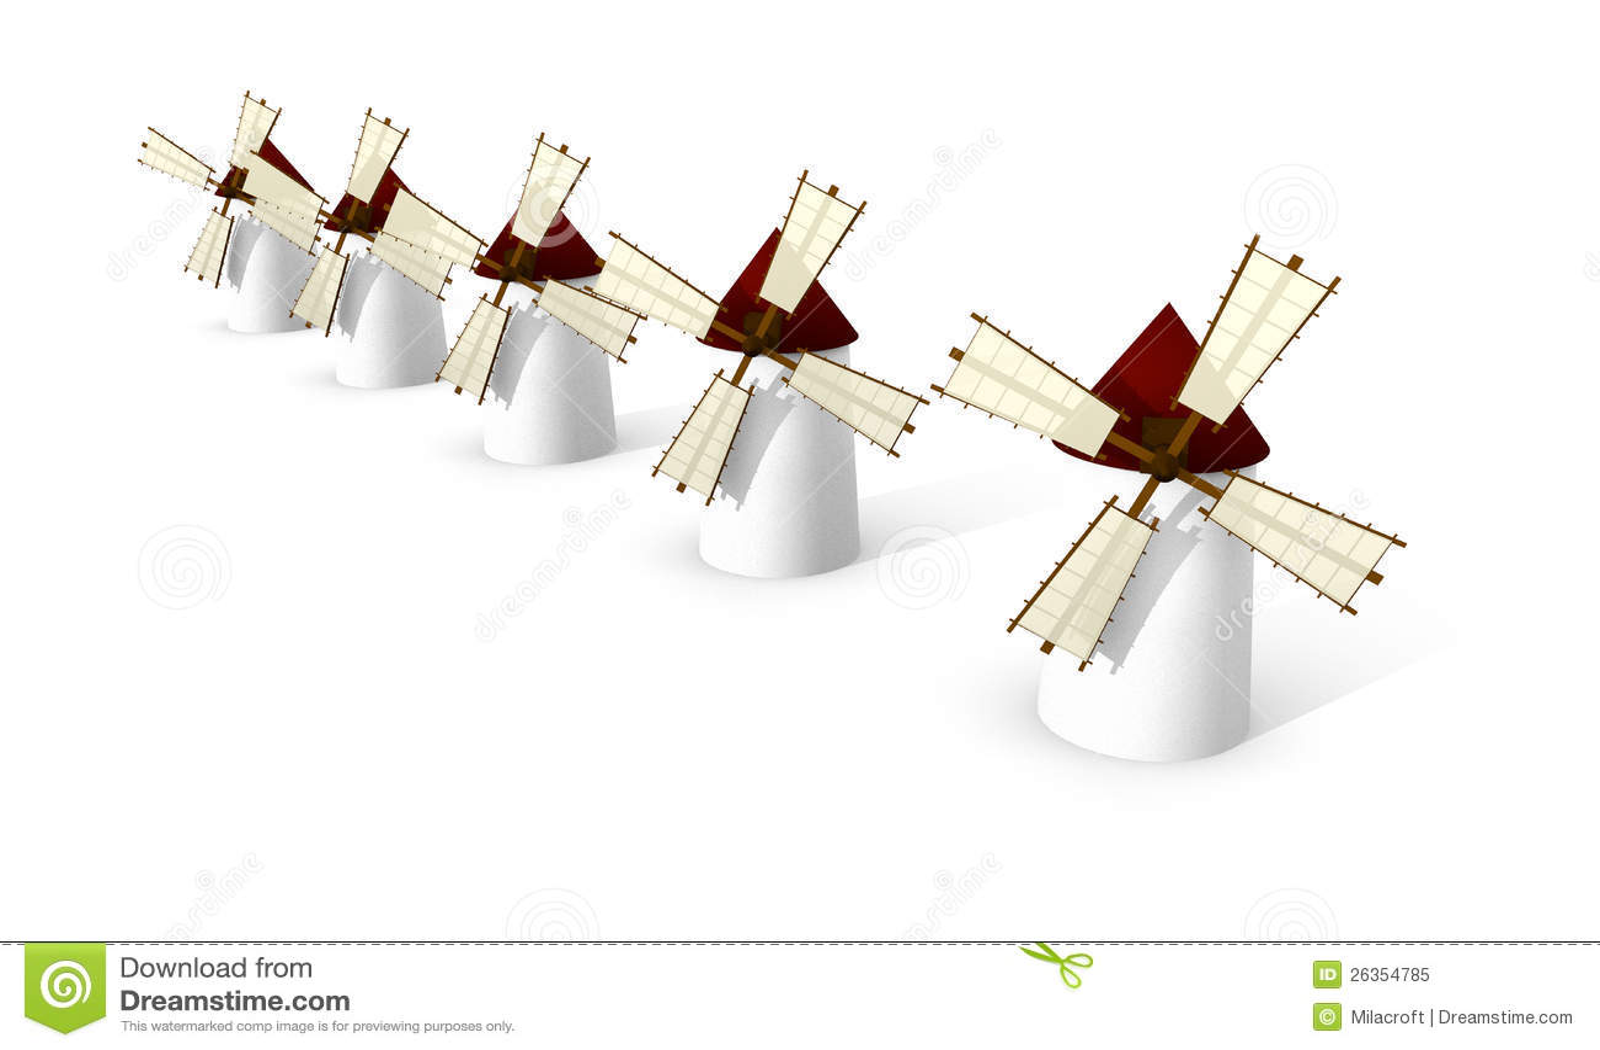 Windmills on white background